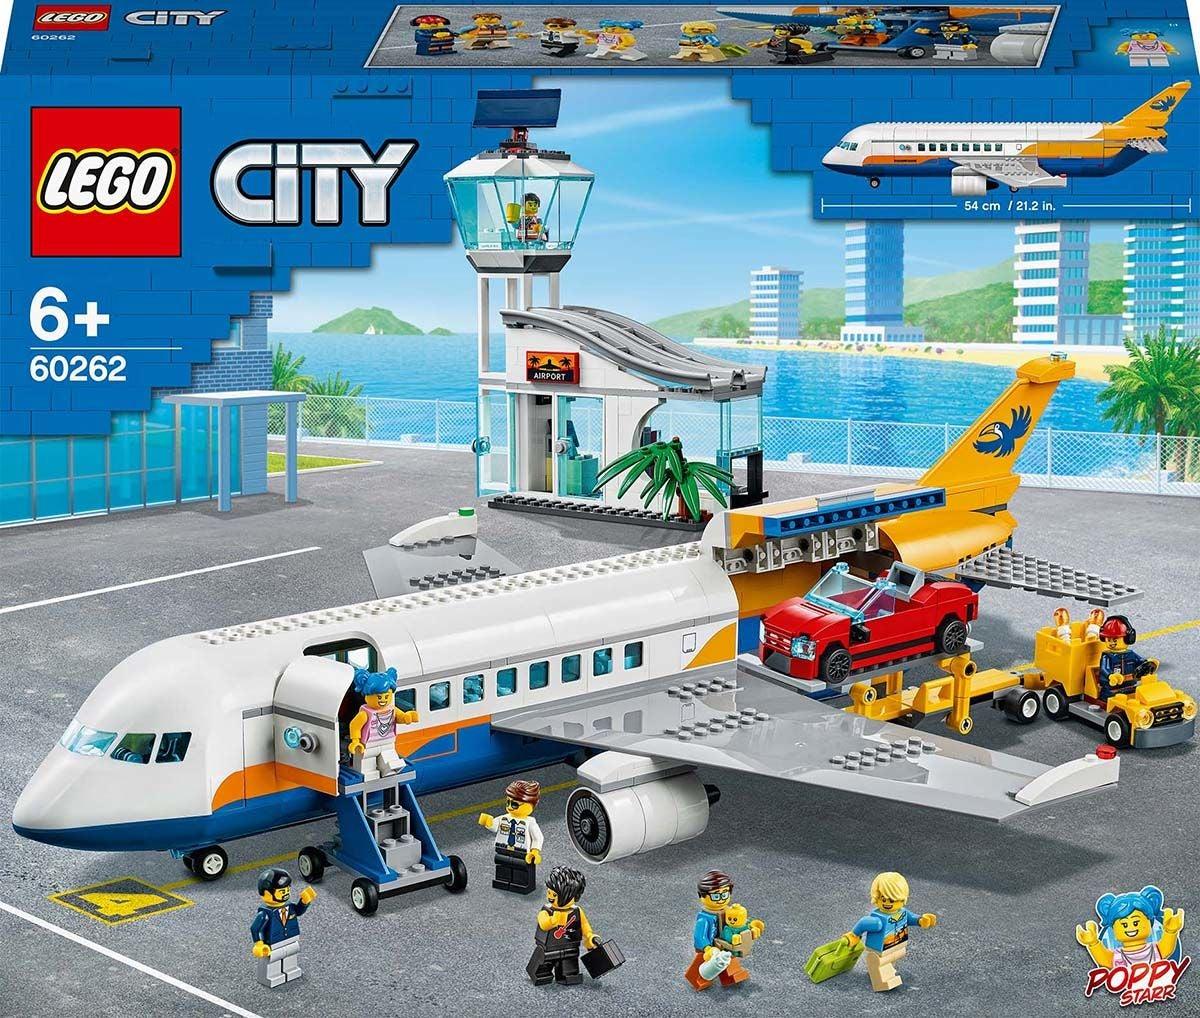 LEGO City Airport 60262 Matkustajalentokone